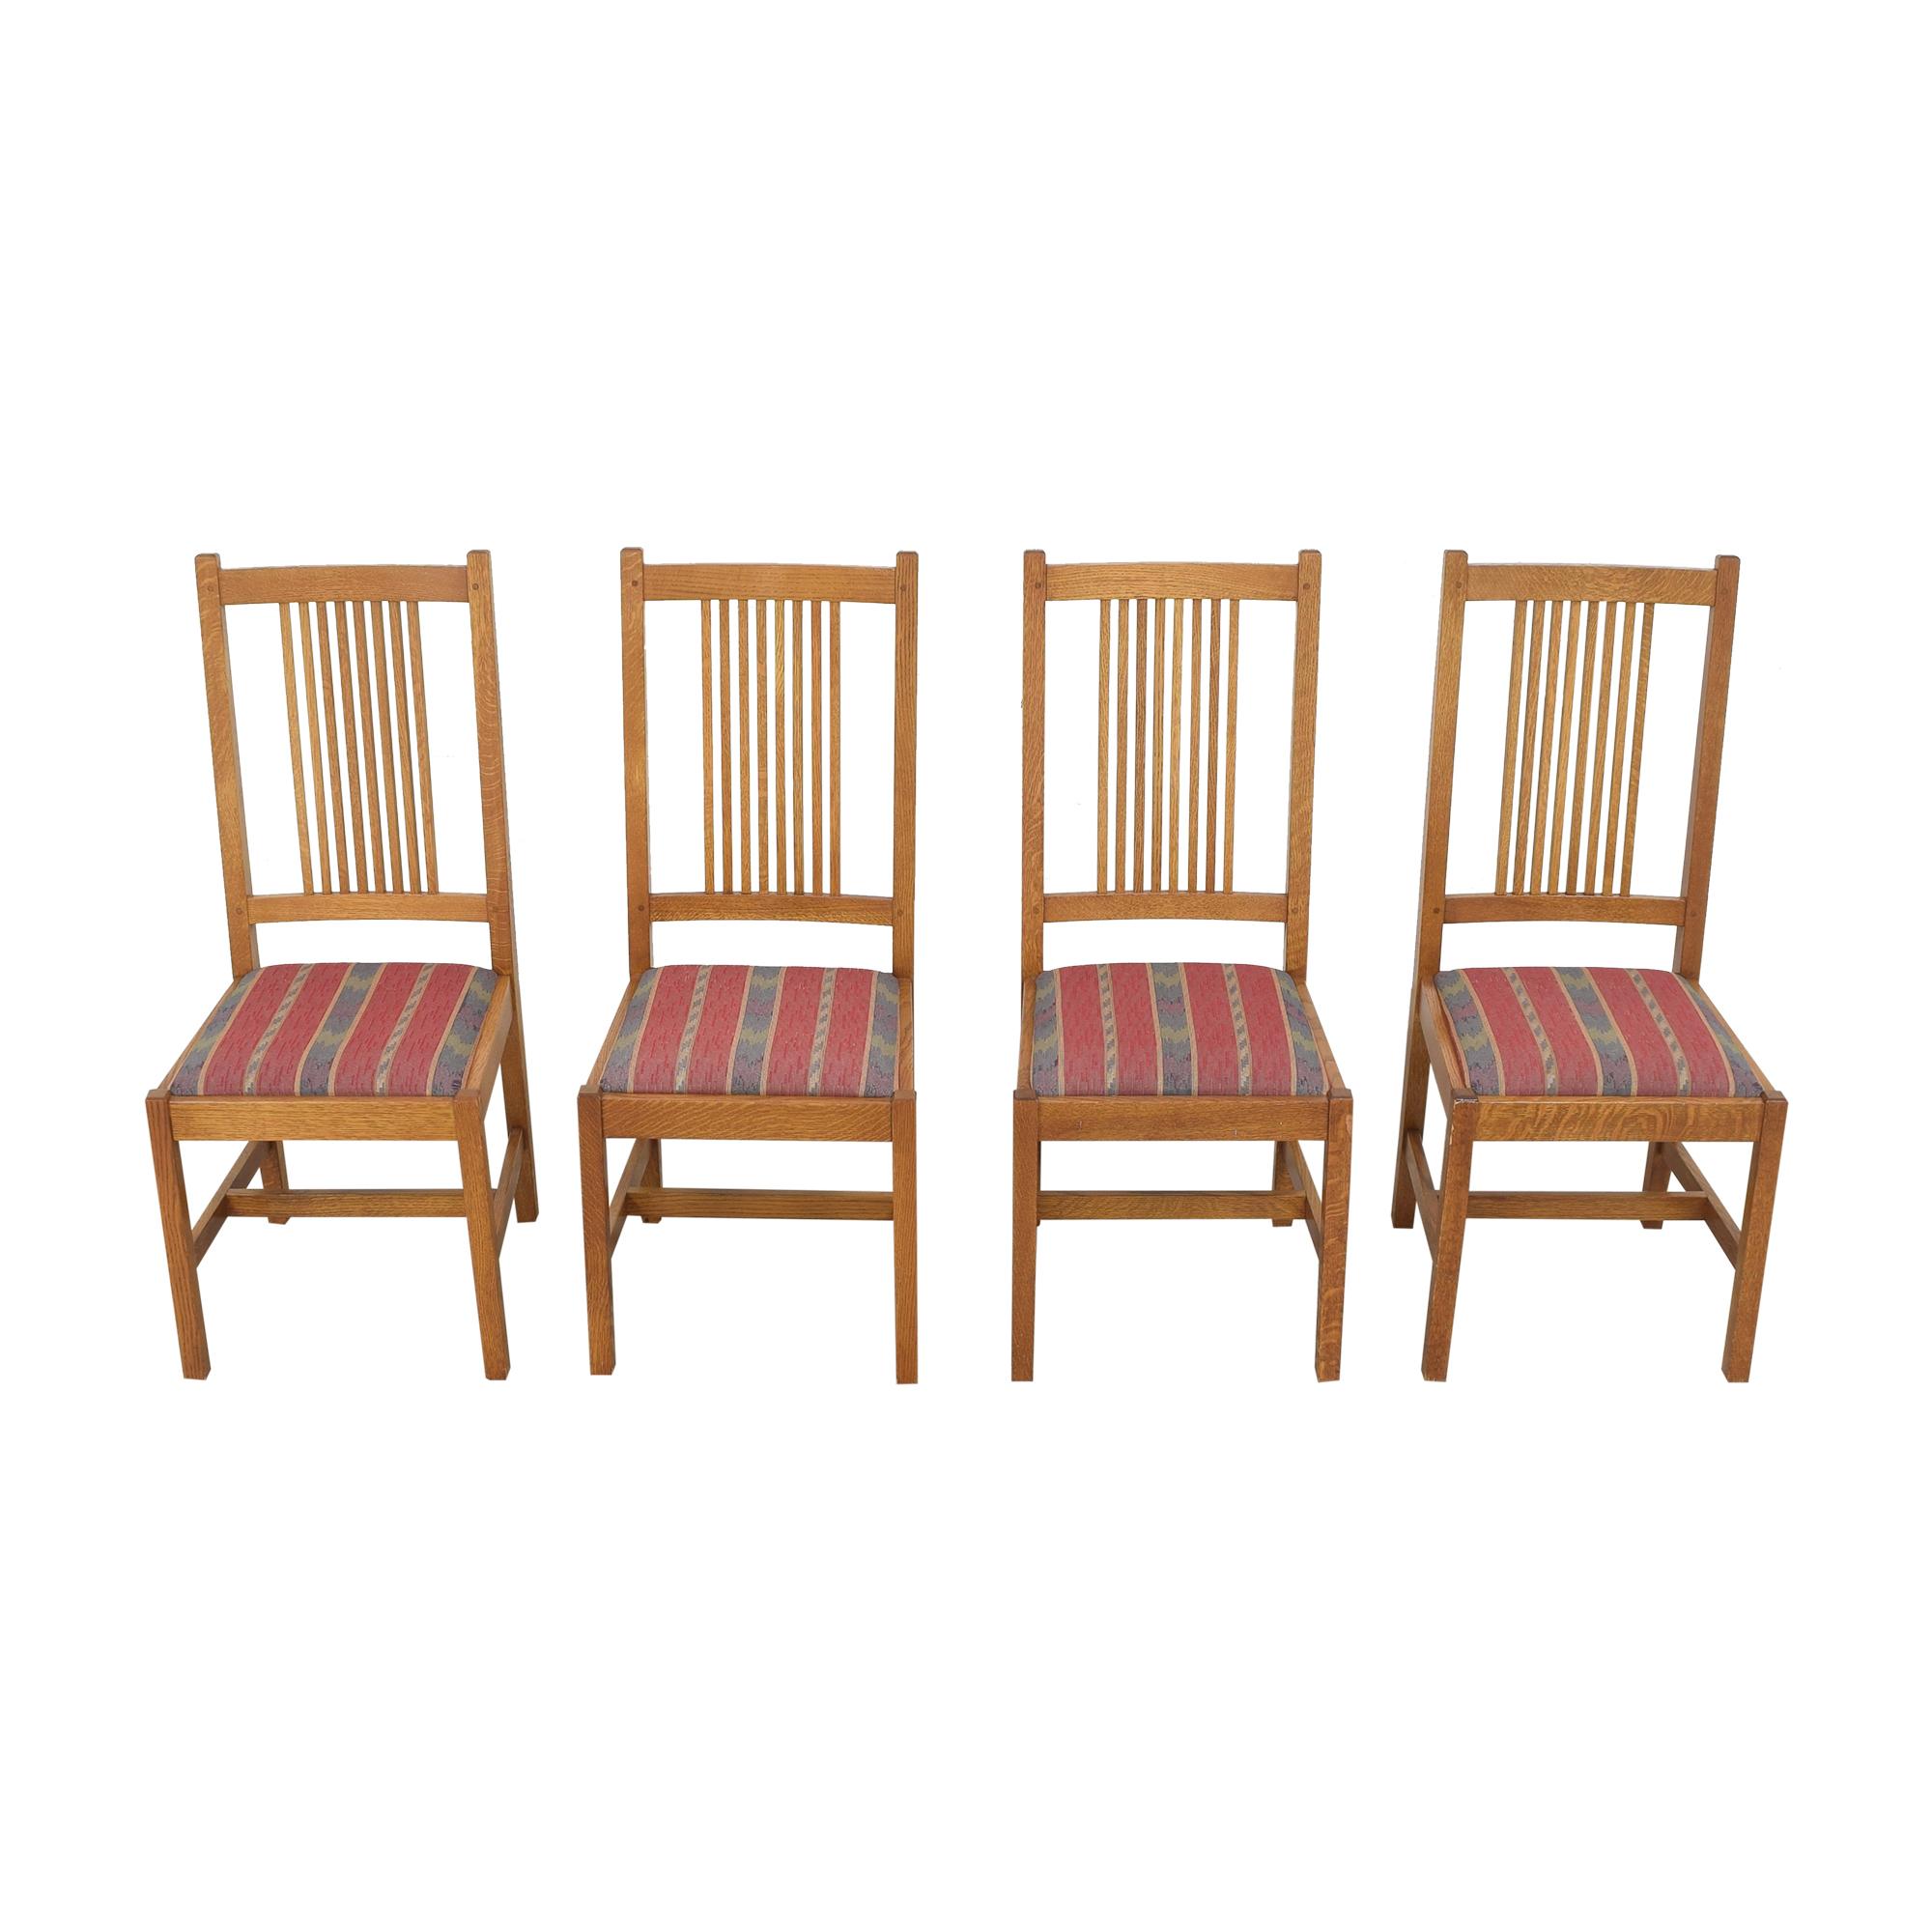 Stickley Furniture Stickley Furniture Mission Side Chairs Brown / Multi